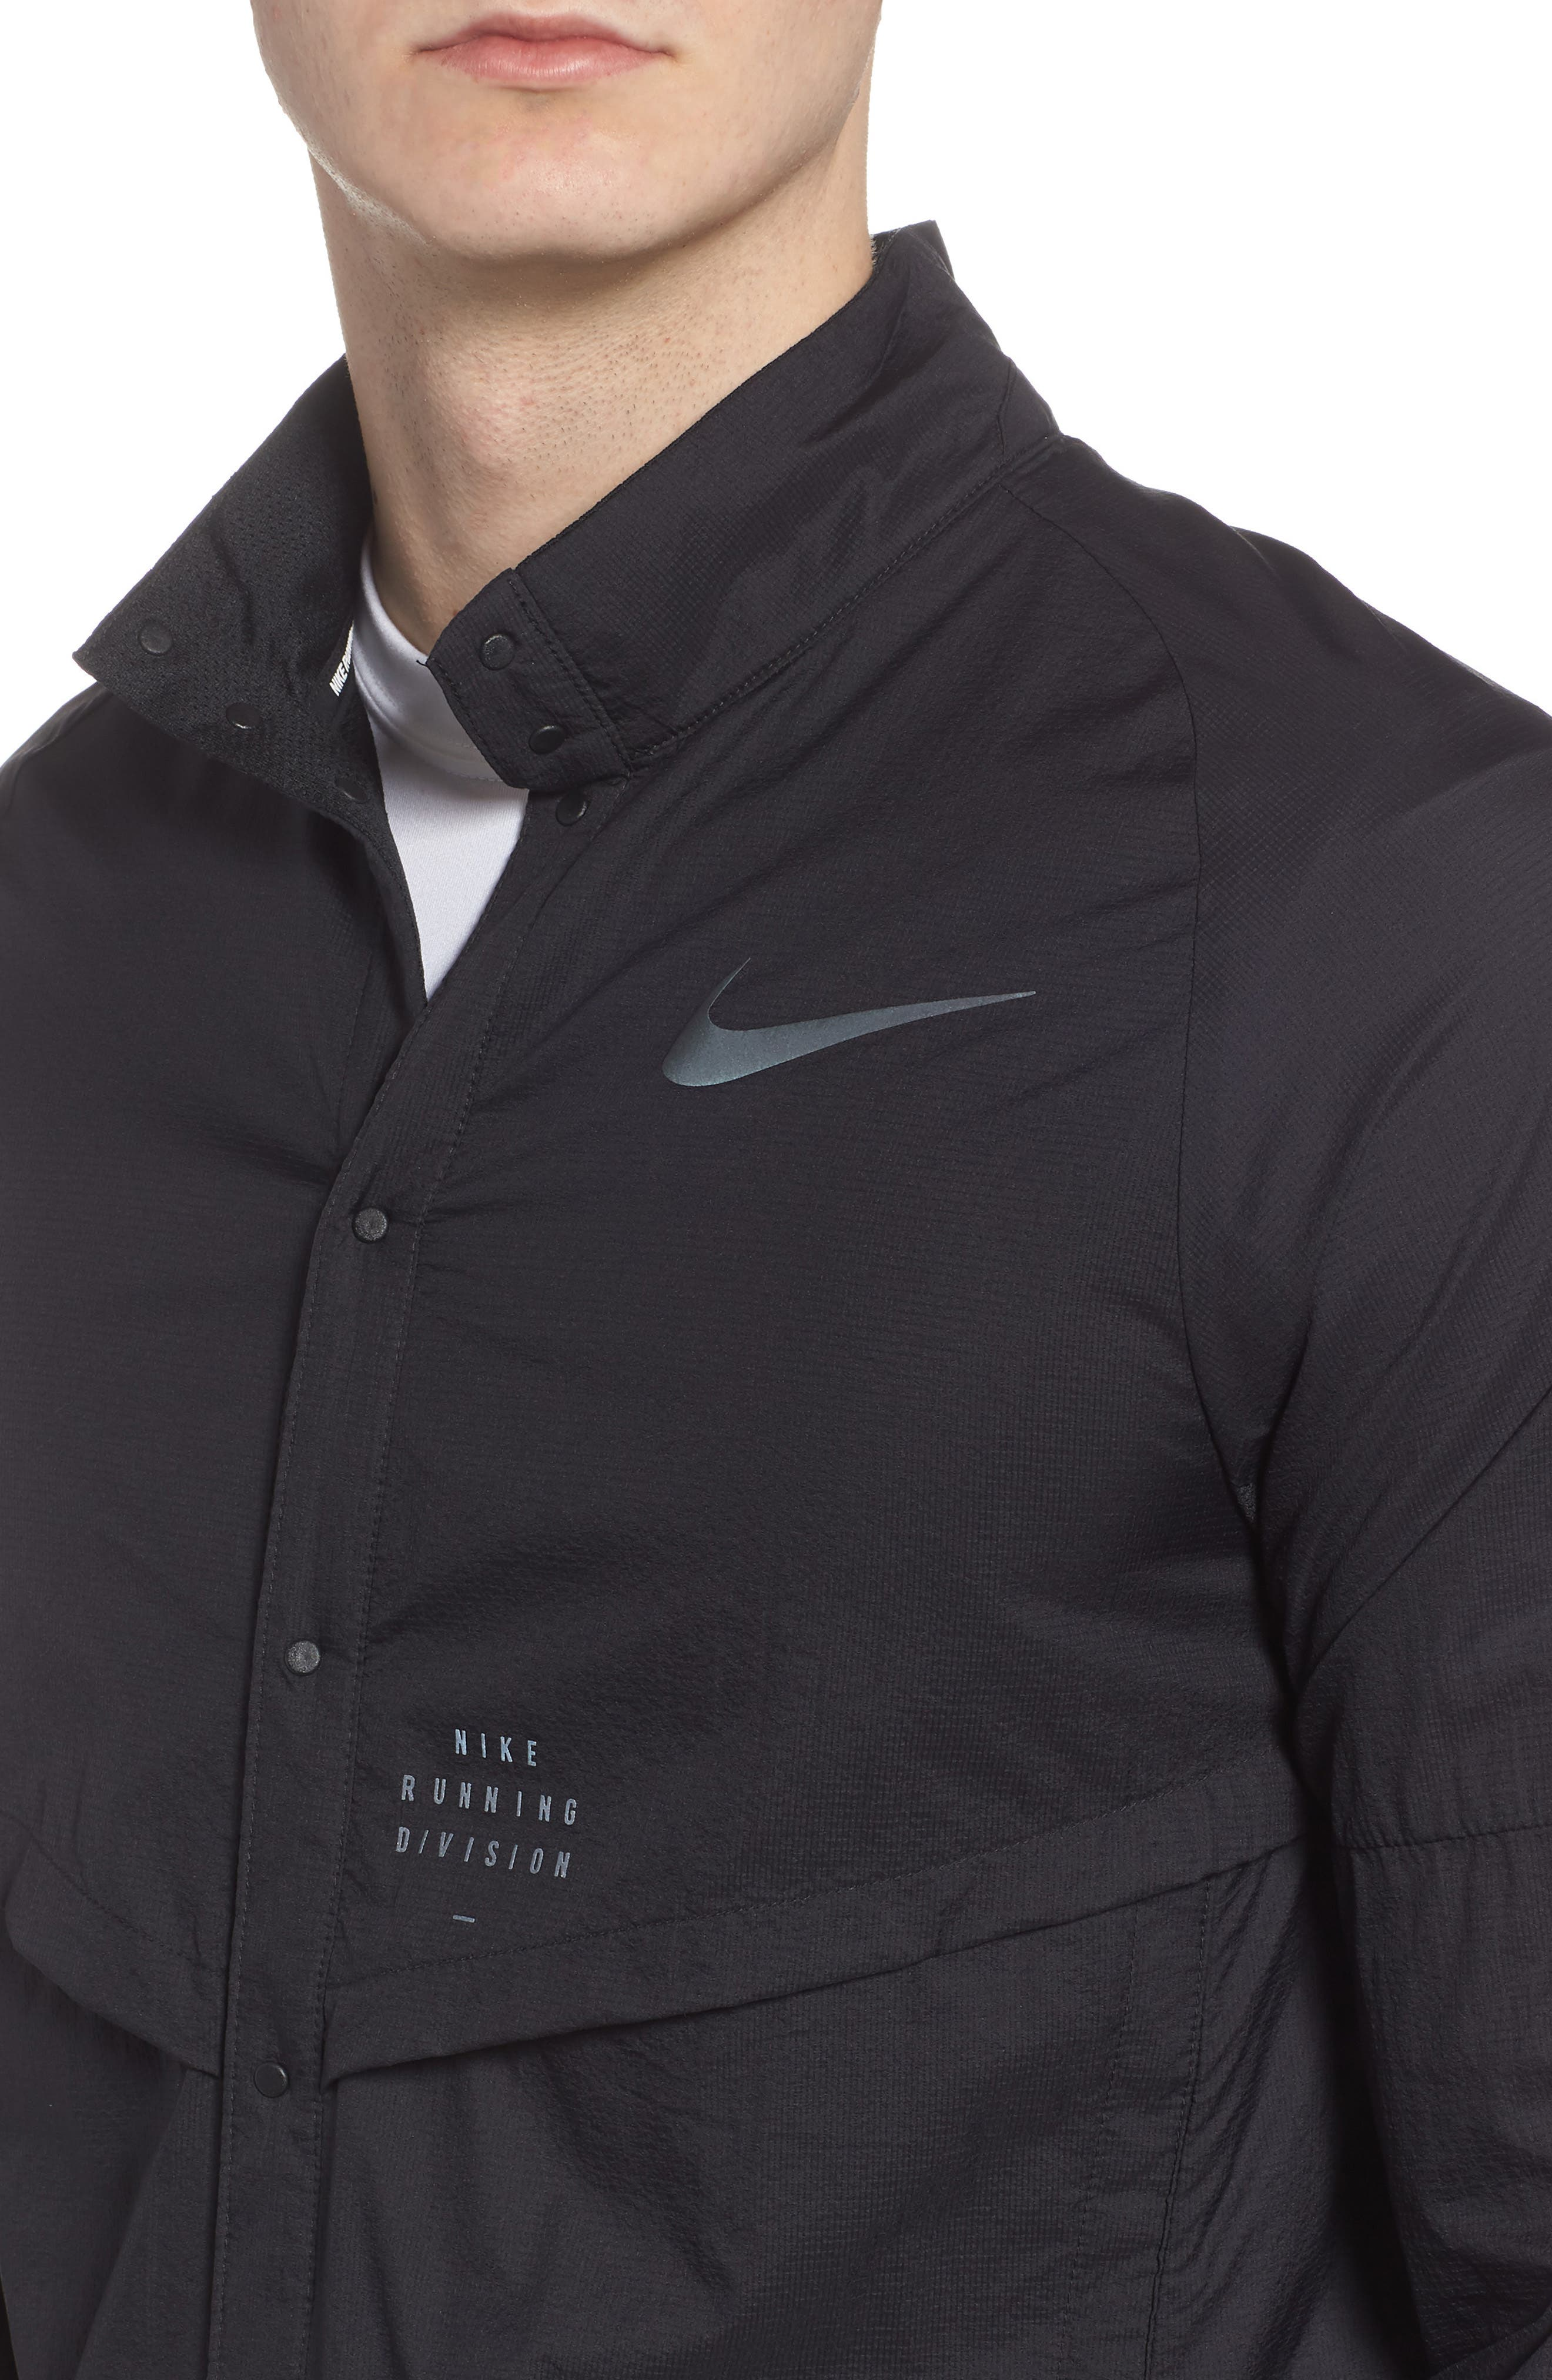 Run Division Jacket,                             Alternate thumbnail 4, color,                             BLACK